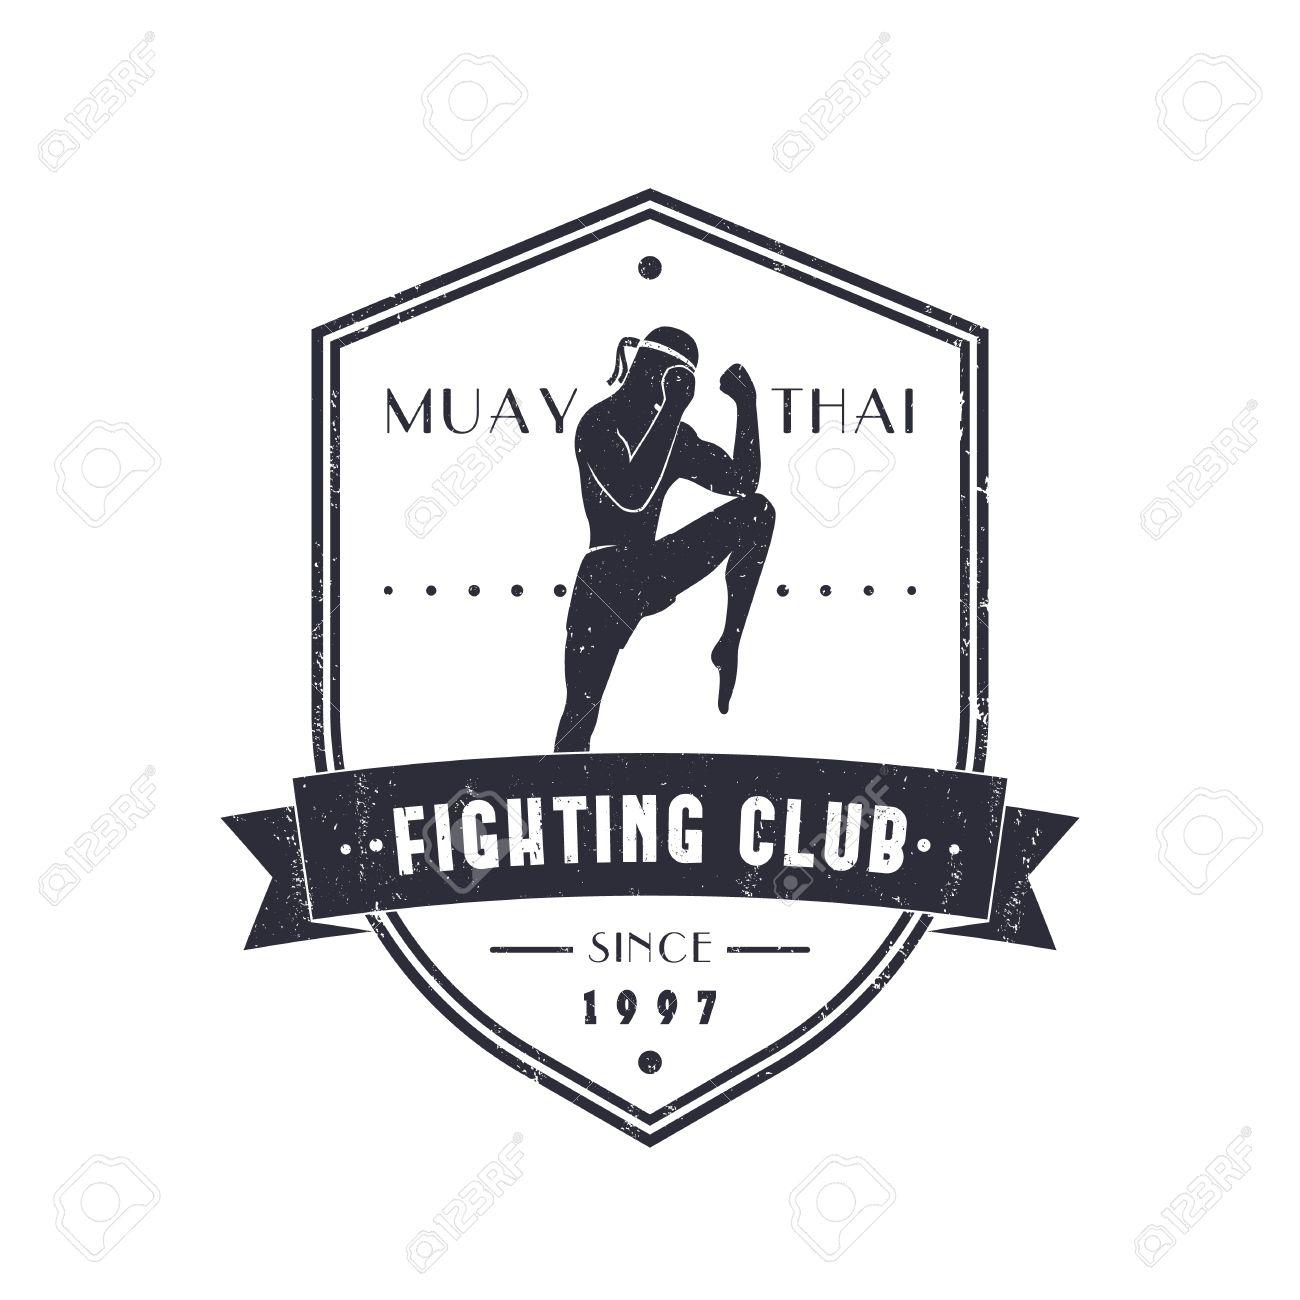 Shirt design easy - Muay Thai Fighting Club Vintage Emblem Logo T Shirt Design On Shield